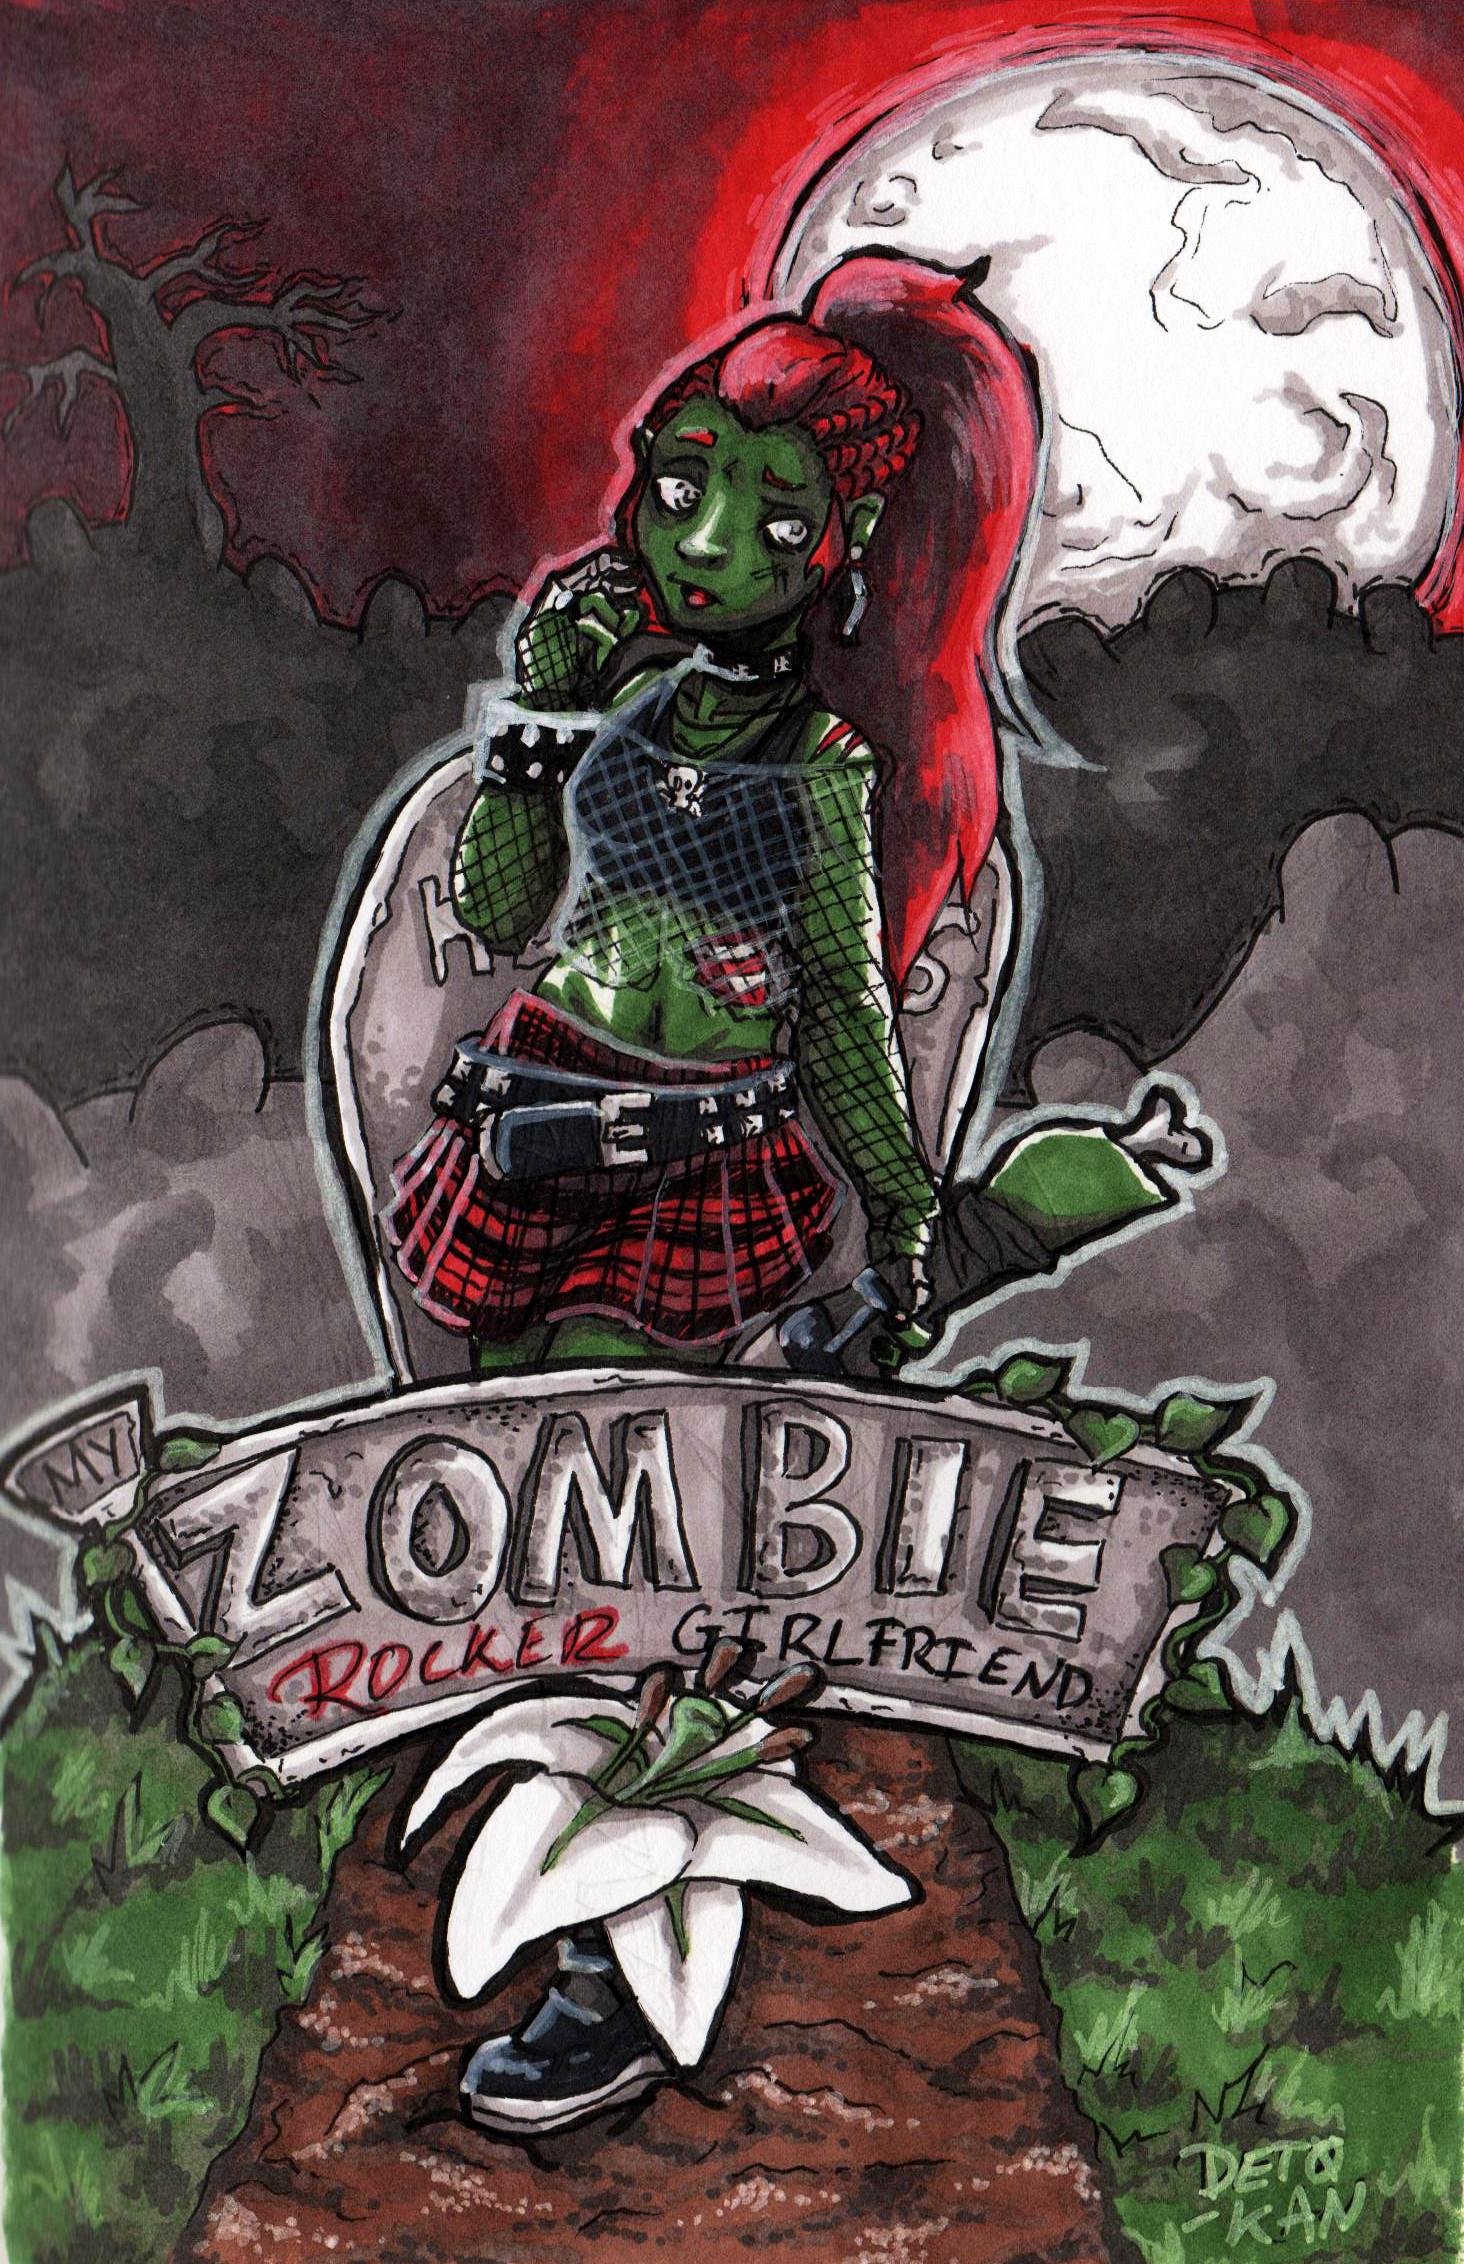 Detonya kan zombierockergirl